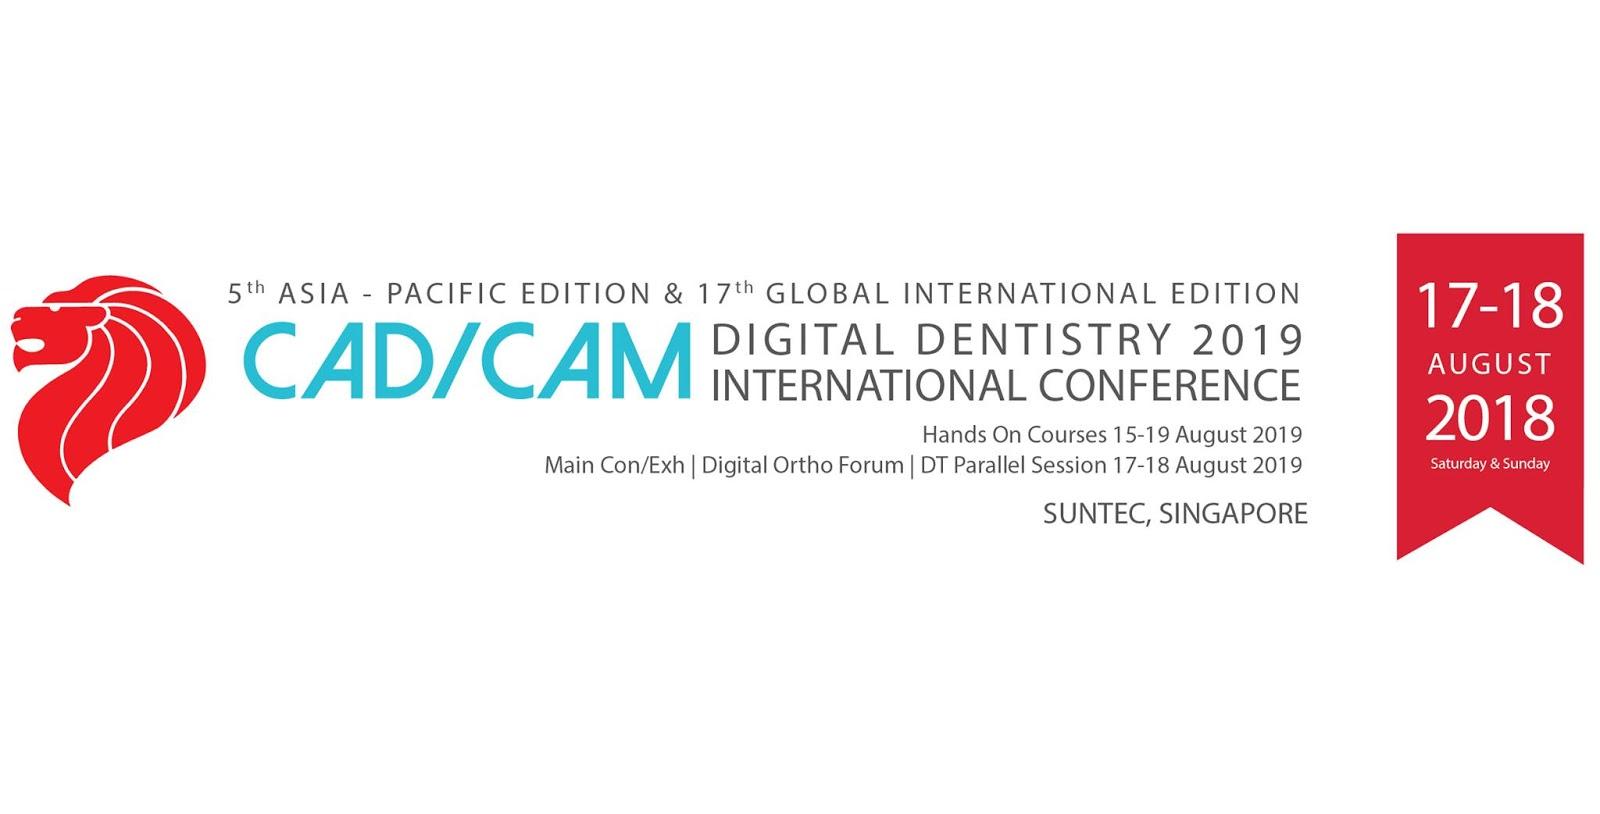 2019 Aug 17-18: CAD/CAM & Digital Dentistry Conference & Exhibition